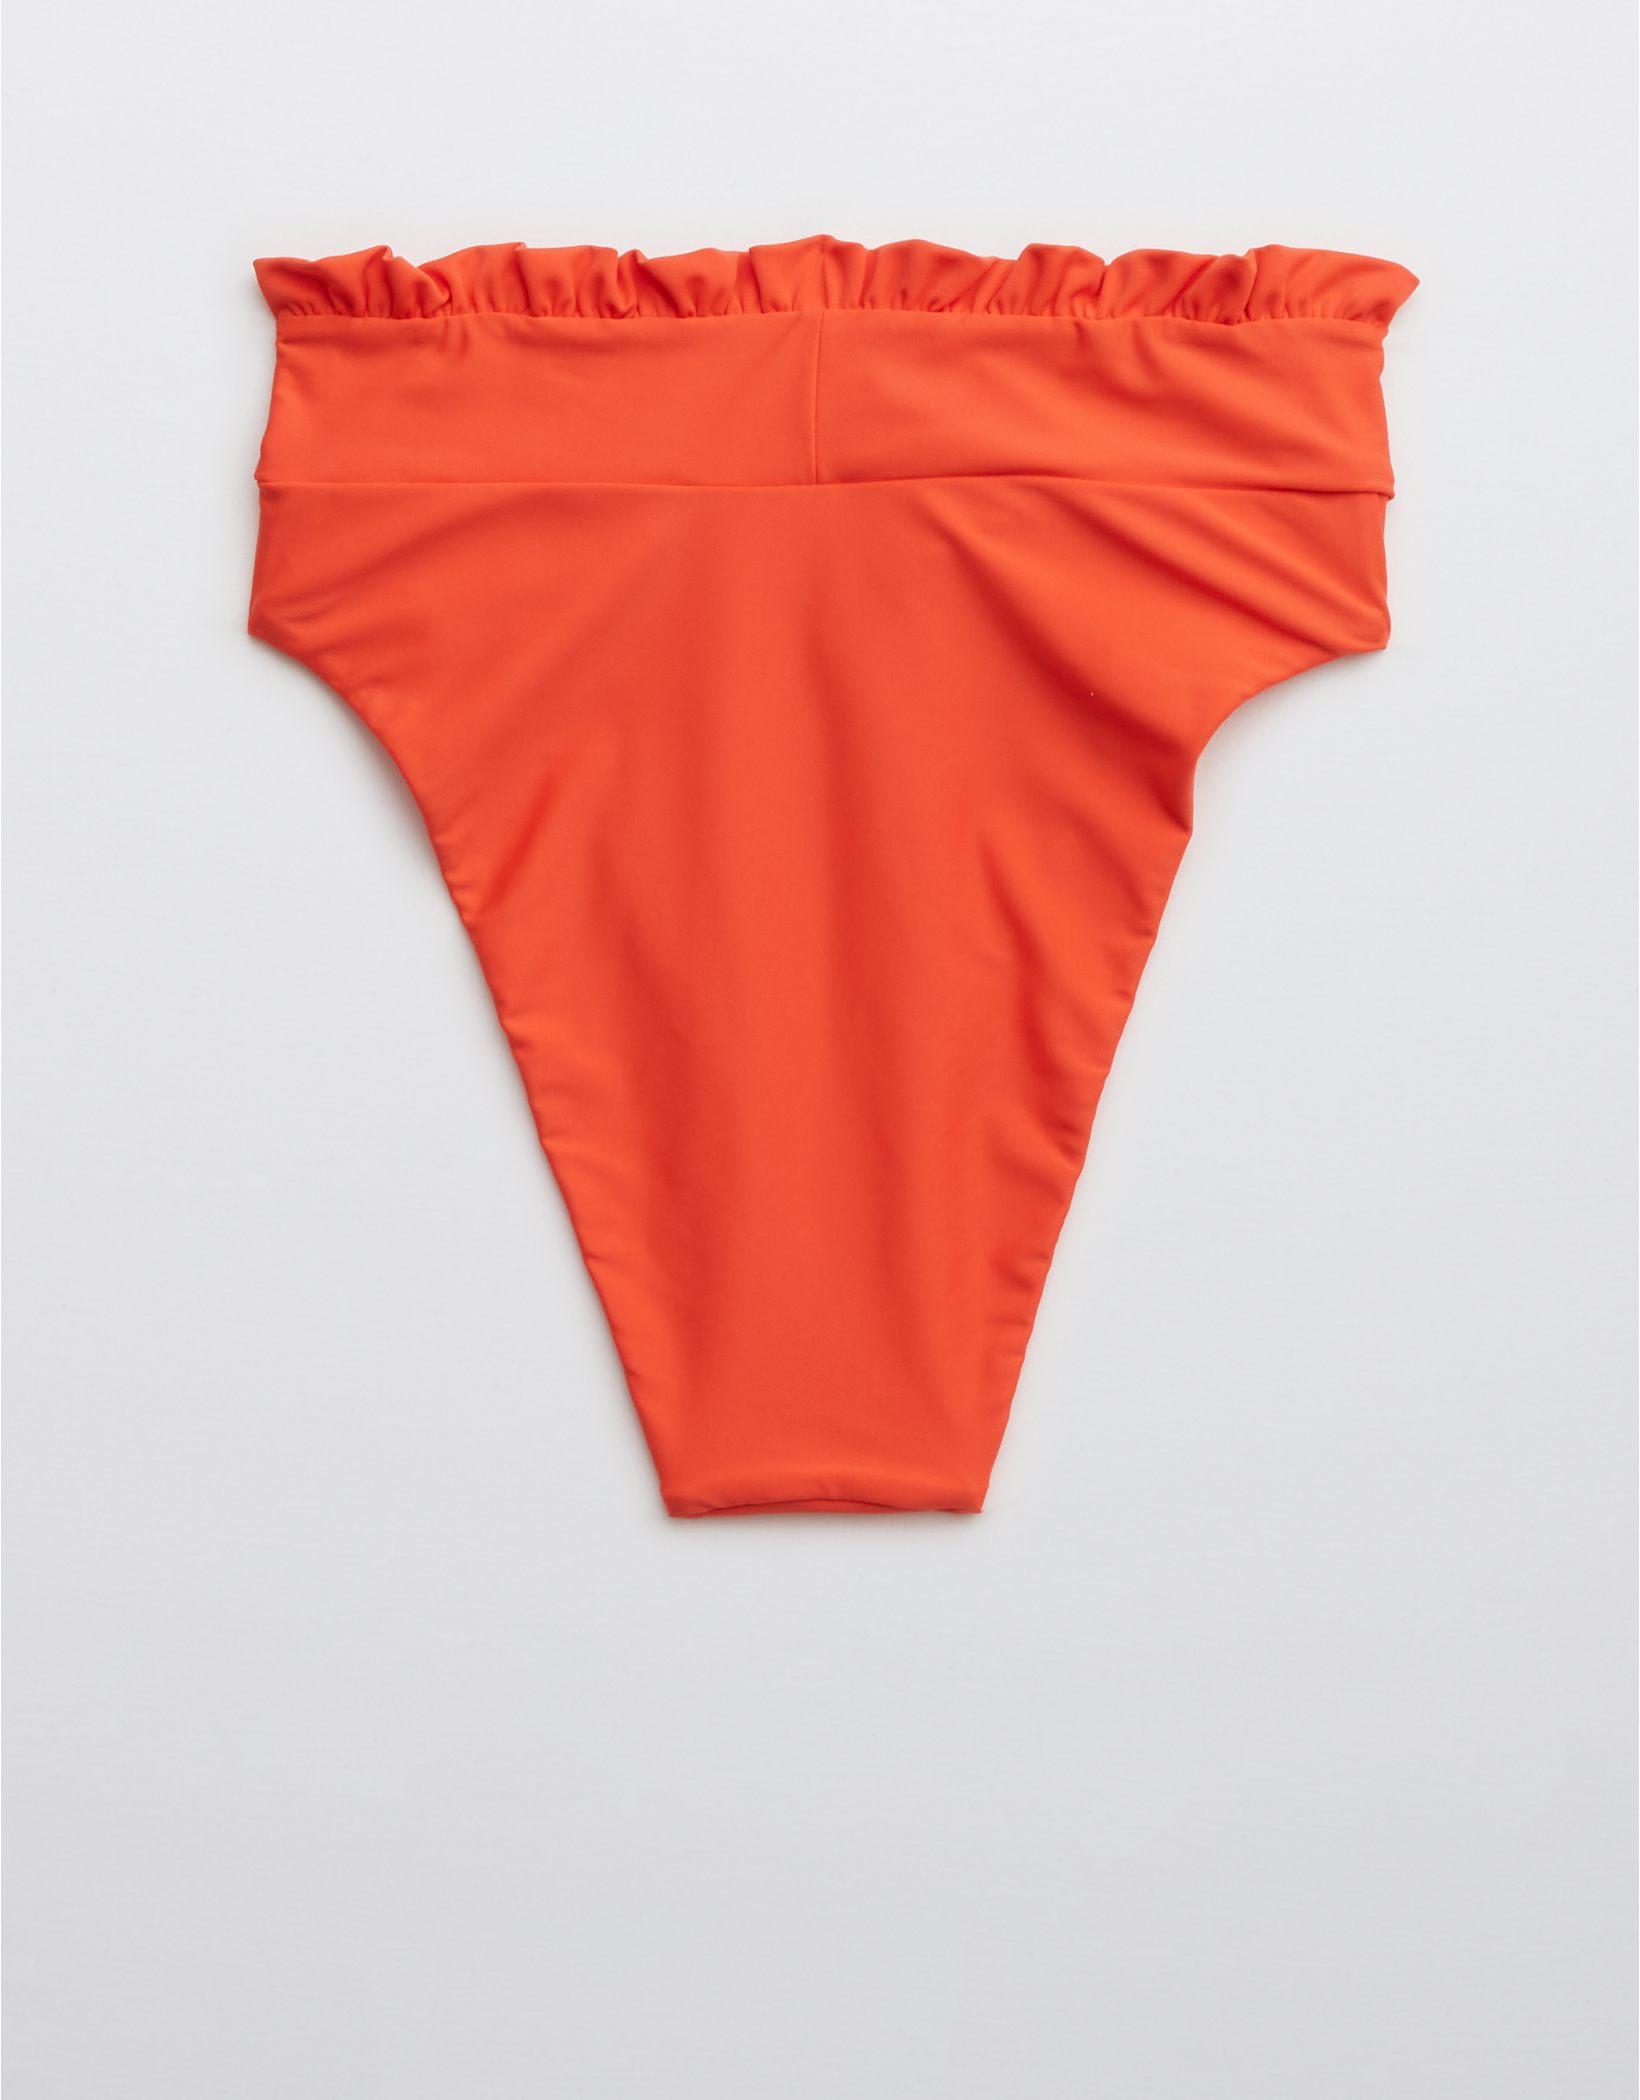 Aerie Ruffle Crossover High Cut Cheeky Bikini Bottom